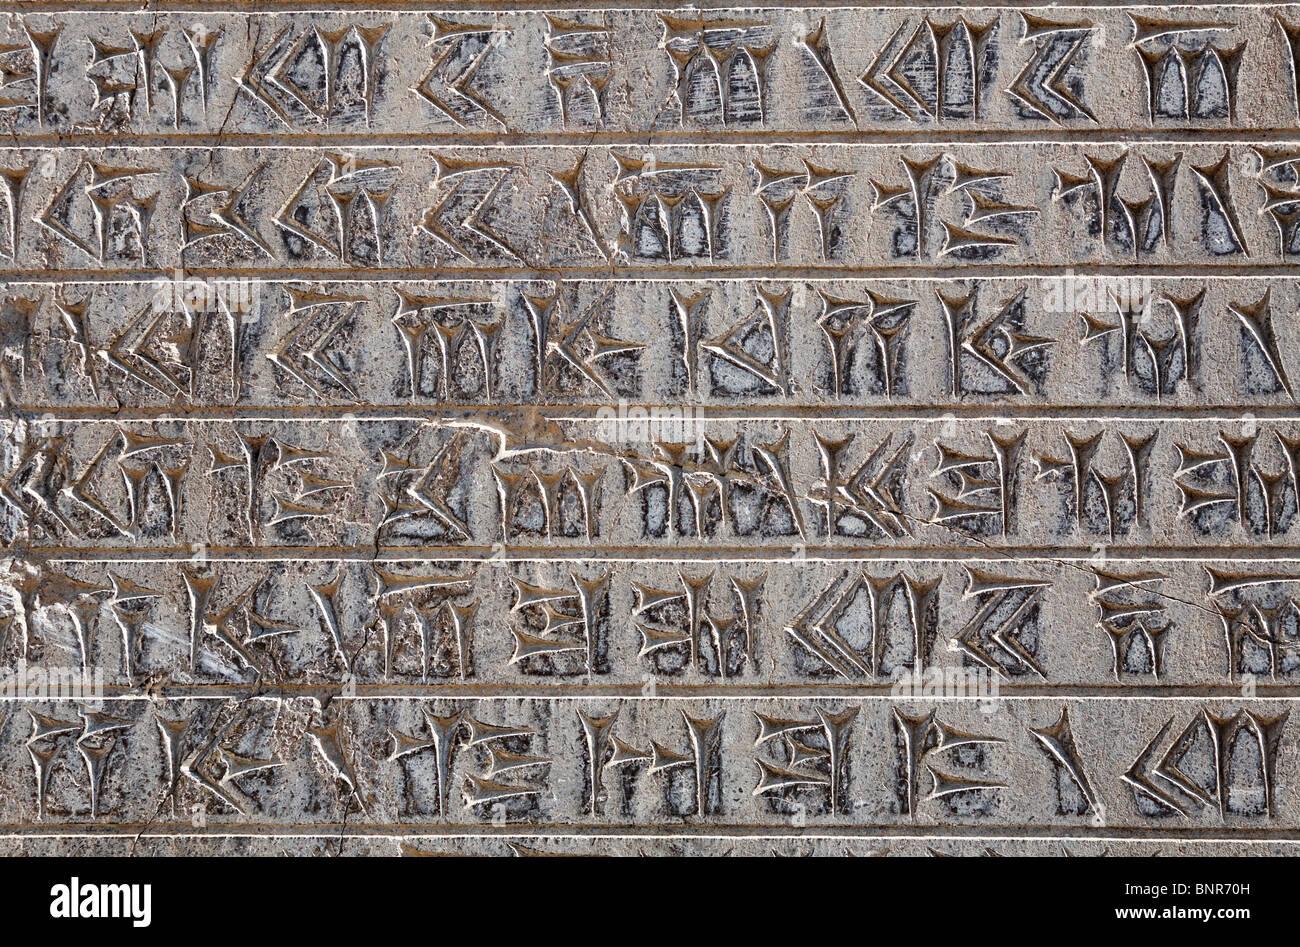 Iran - Persepolis - Carved cuneiform script - Stock Image